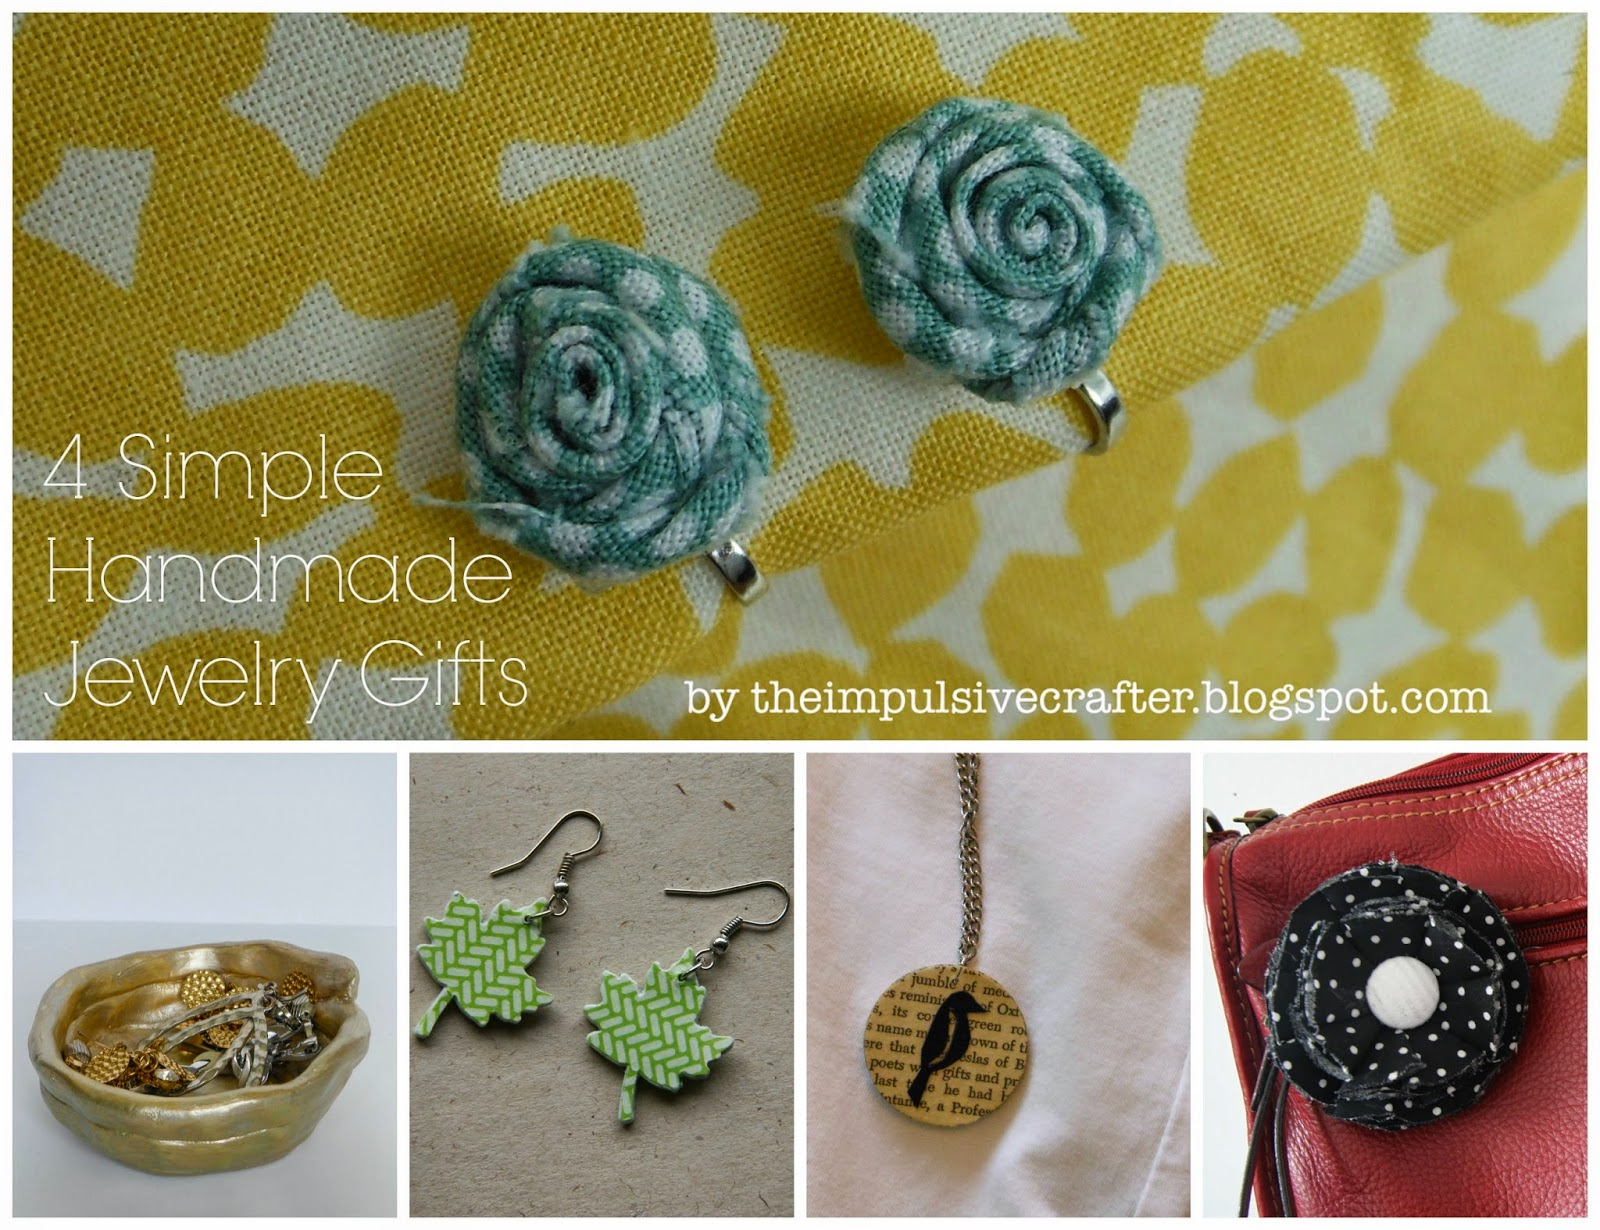 homemade jewelry gifts